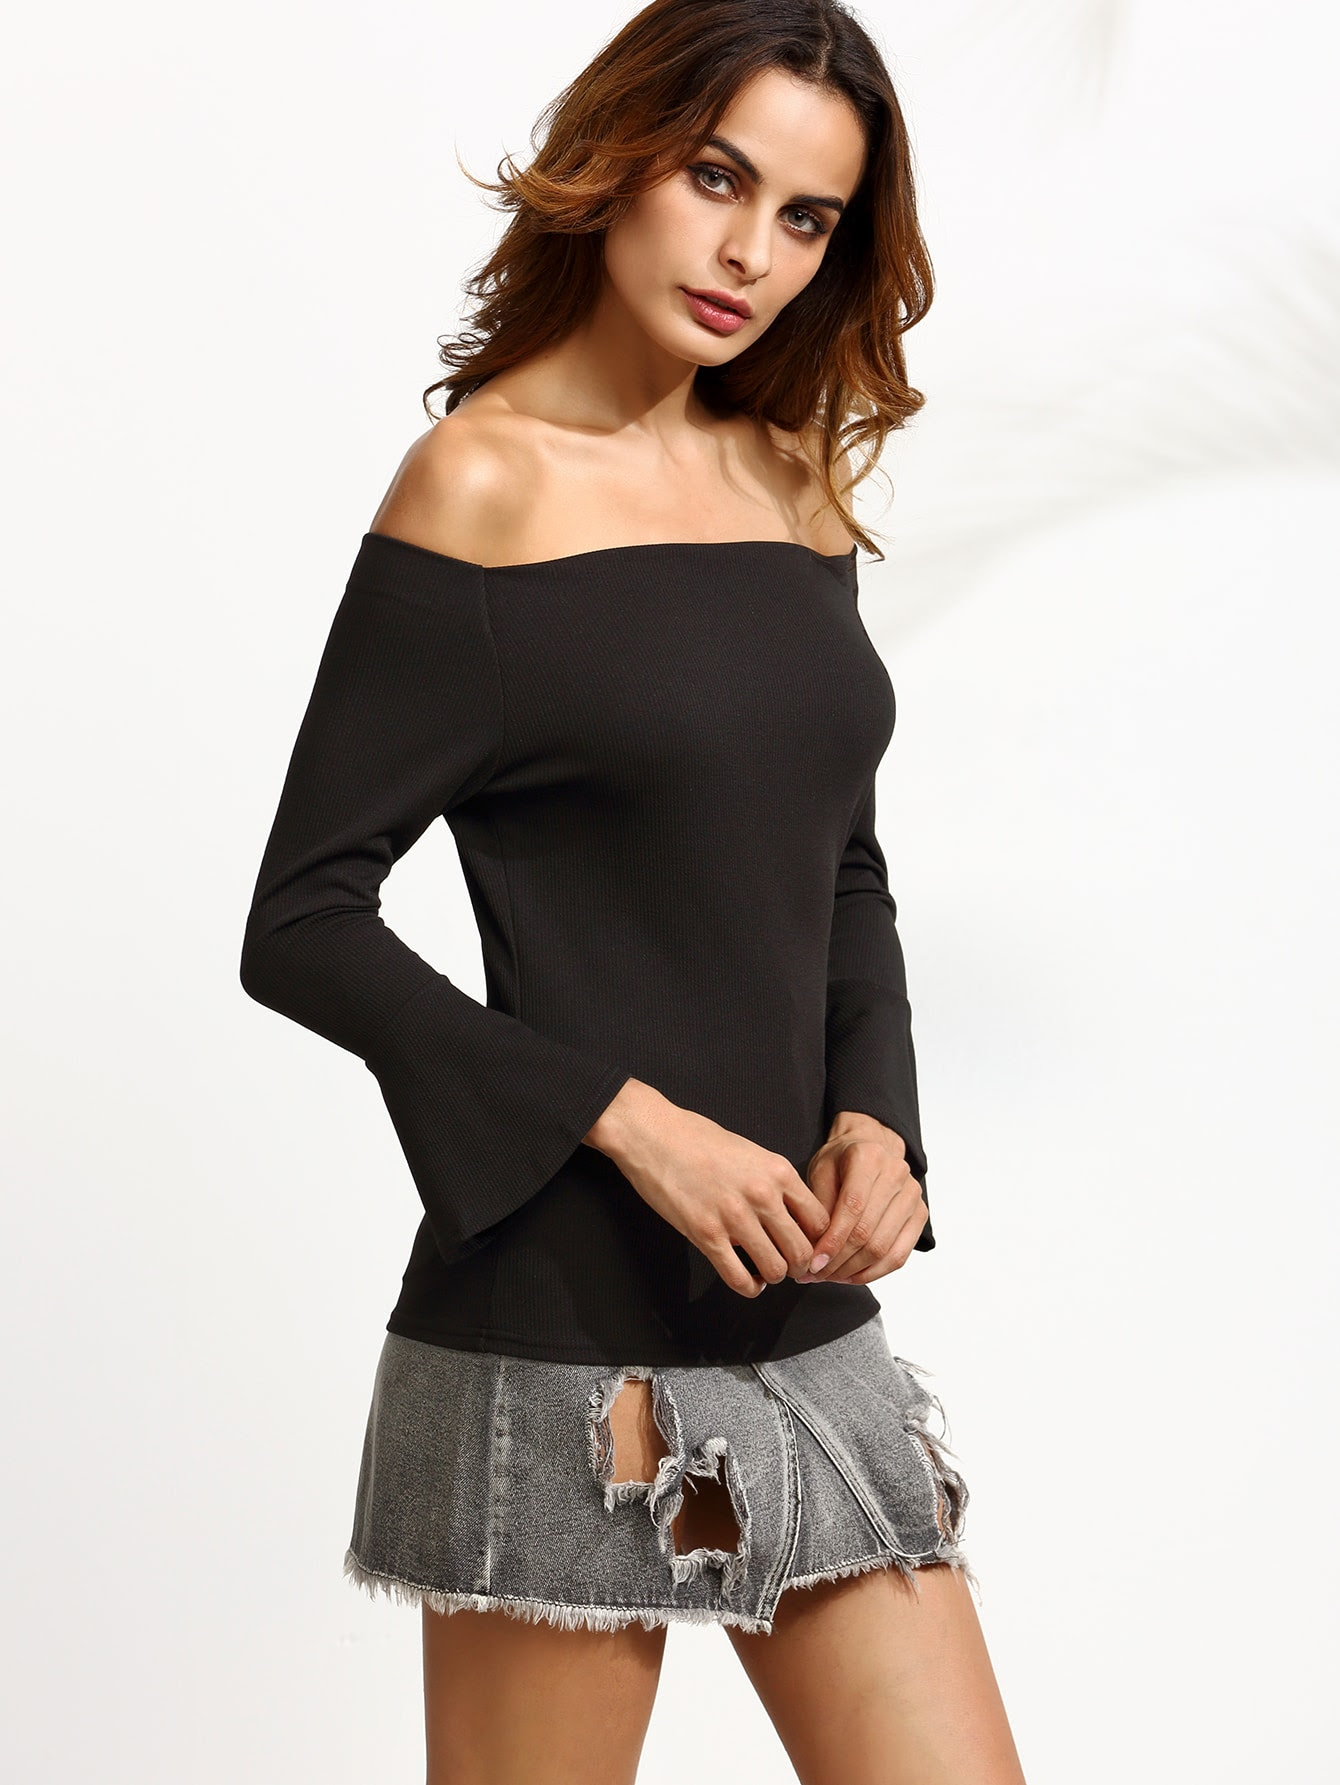 Short sleeves portland Spaghetti Strap Asymmetric Hem Dot Sleeveless Bodycon Dresses and plus